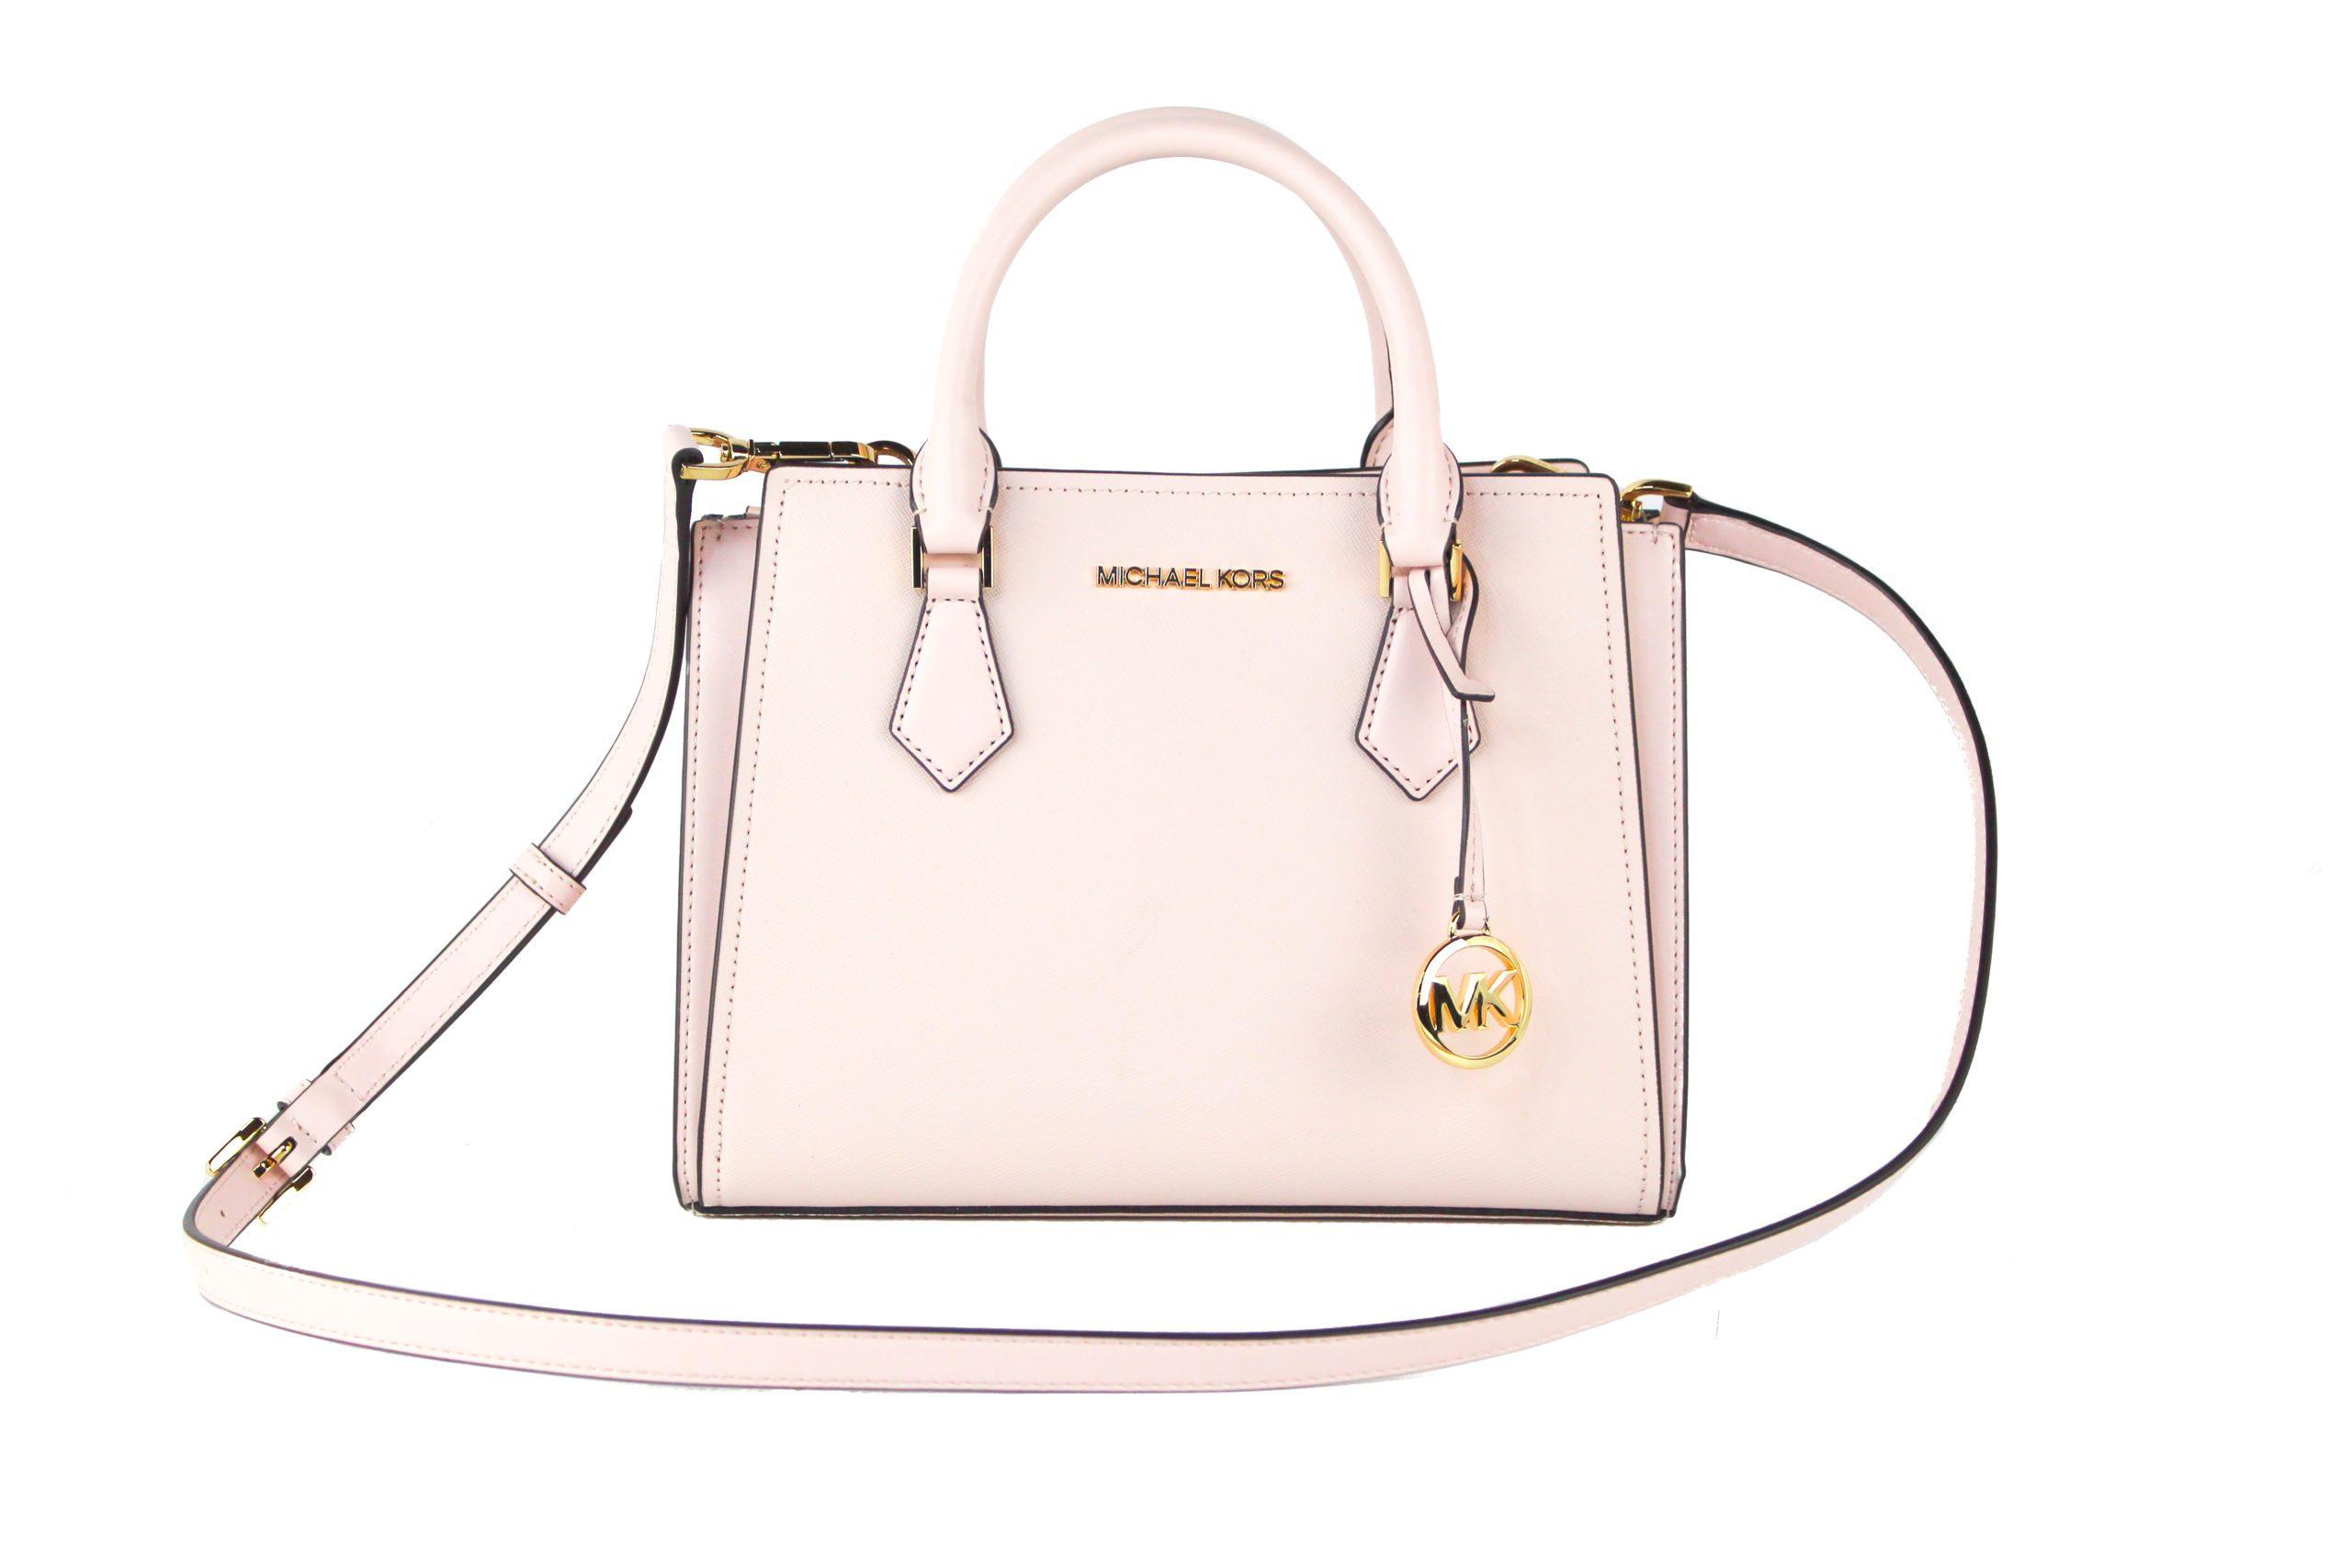 Michael Kors Women's Hope Crossbody Bag Pink 32978